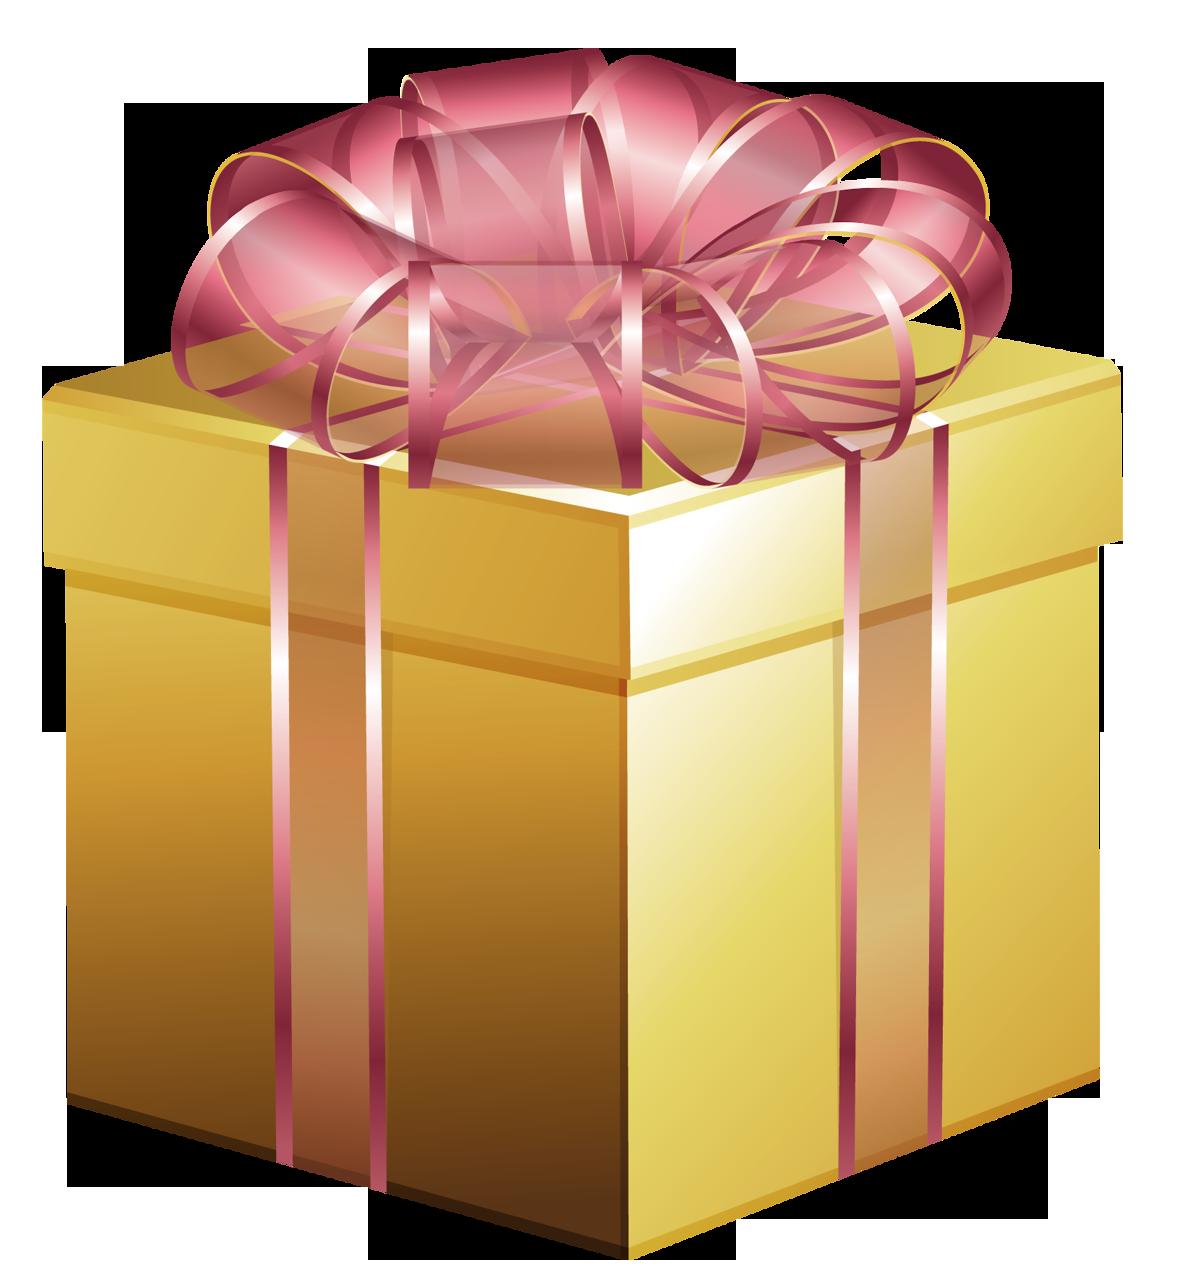 Closet clipart storage box. Gift png image free